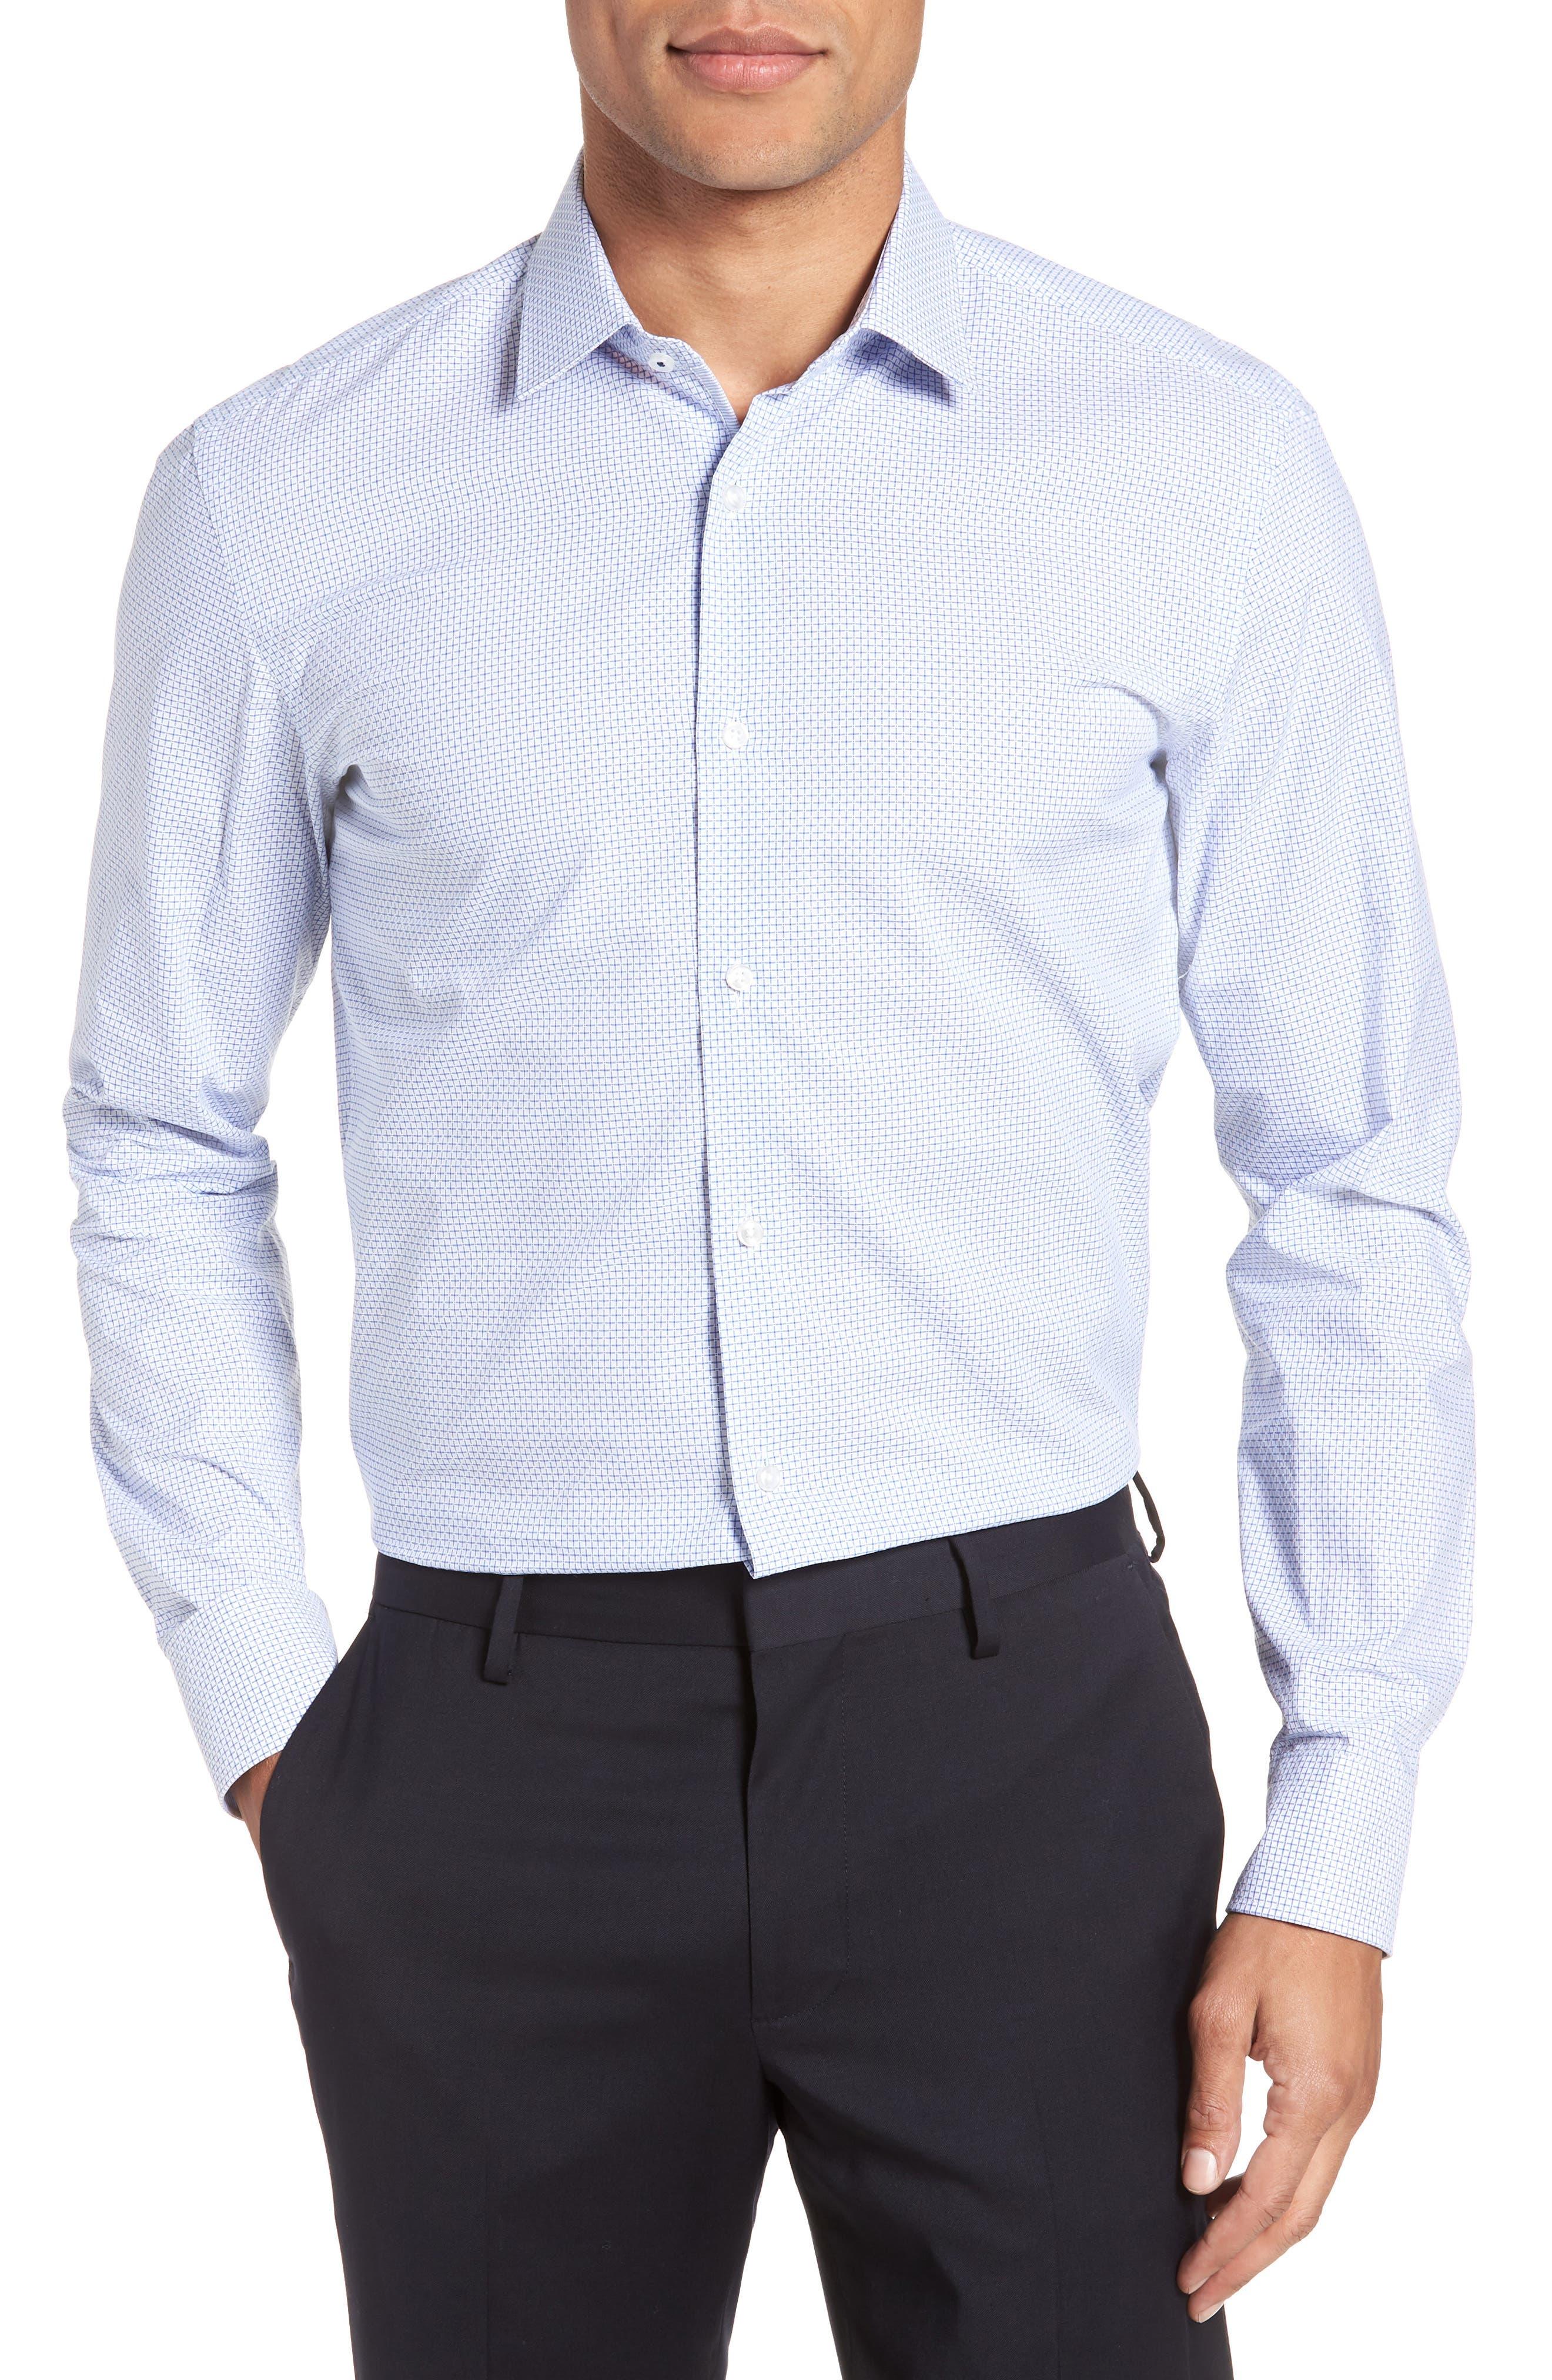 Jesse Slim Fit Check Dress Shirt,                             Main thumbnail 1, color,                             431